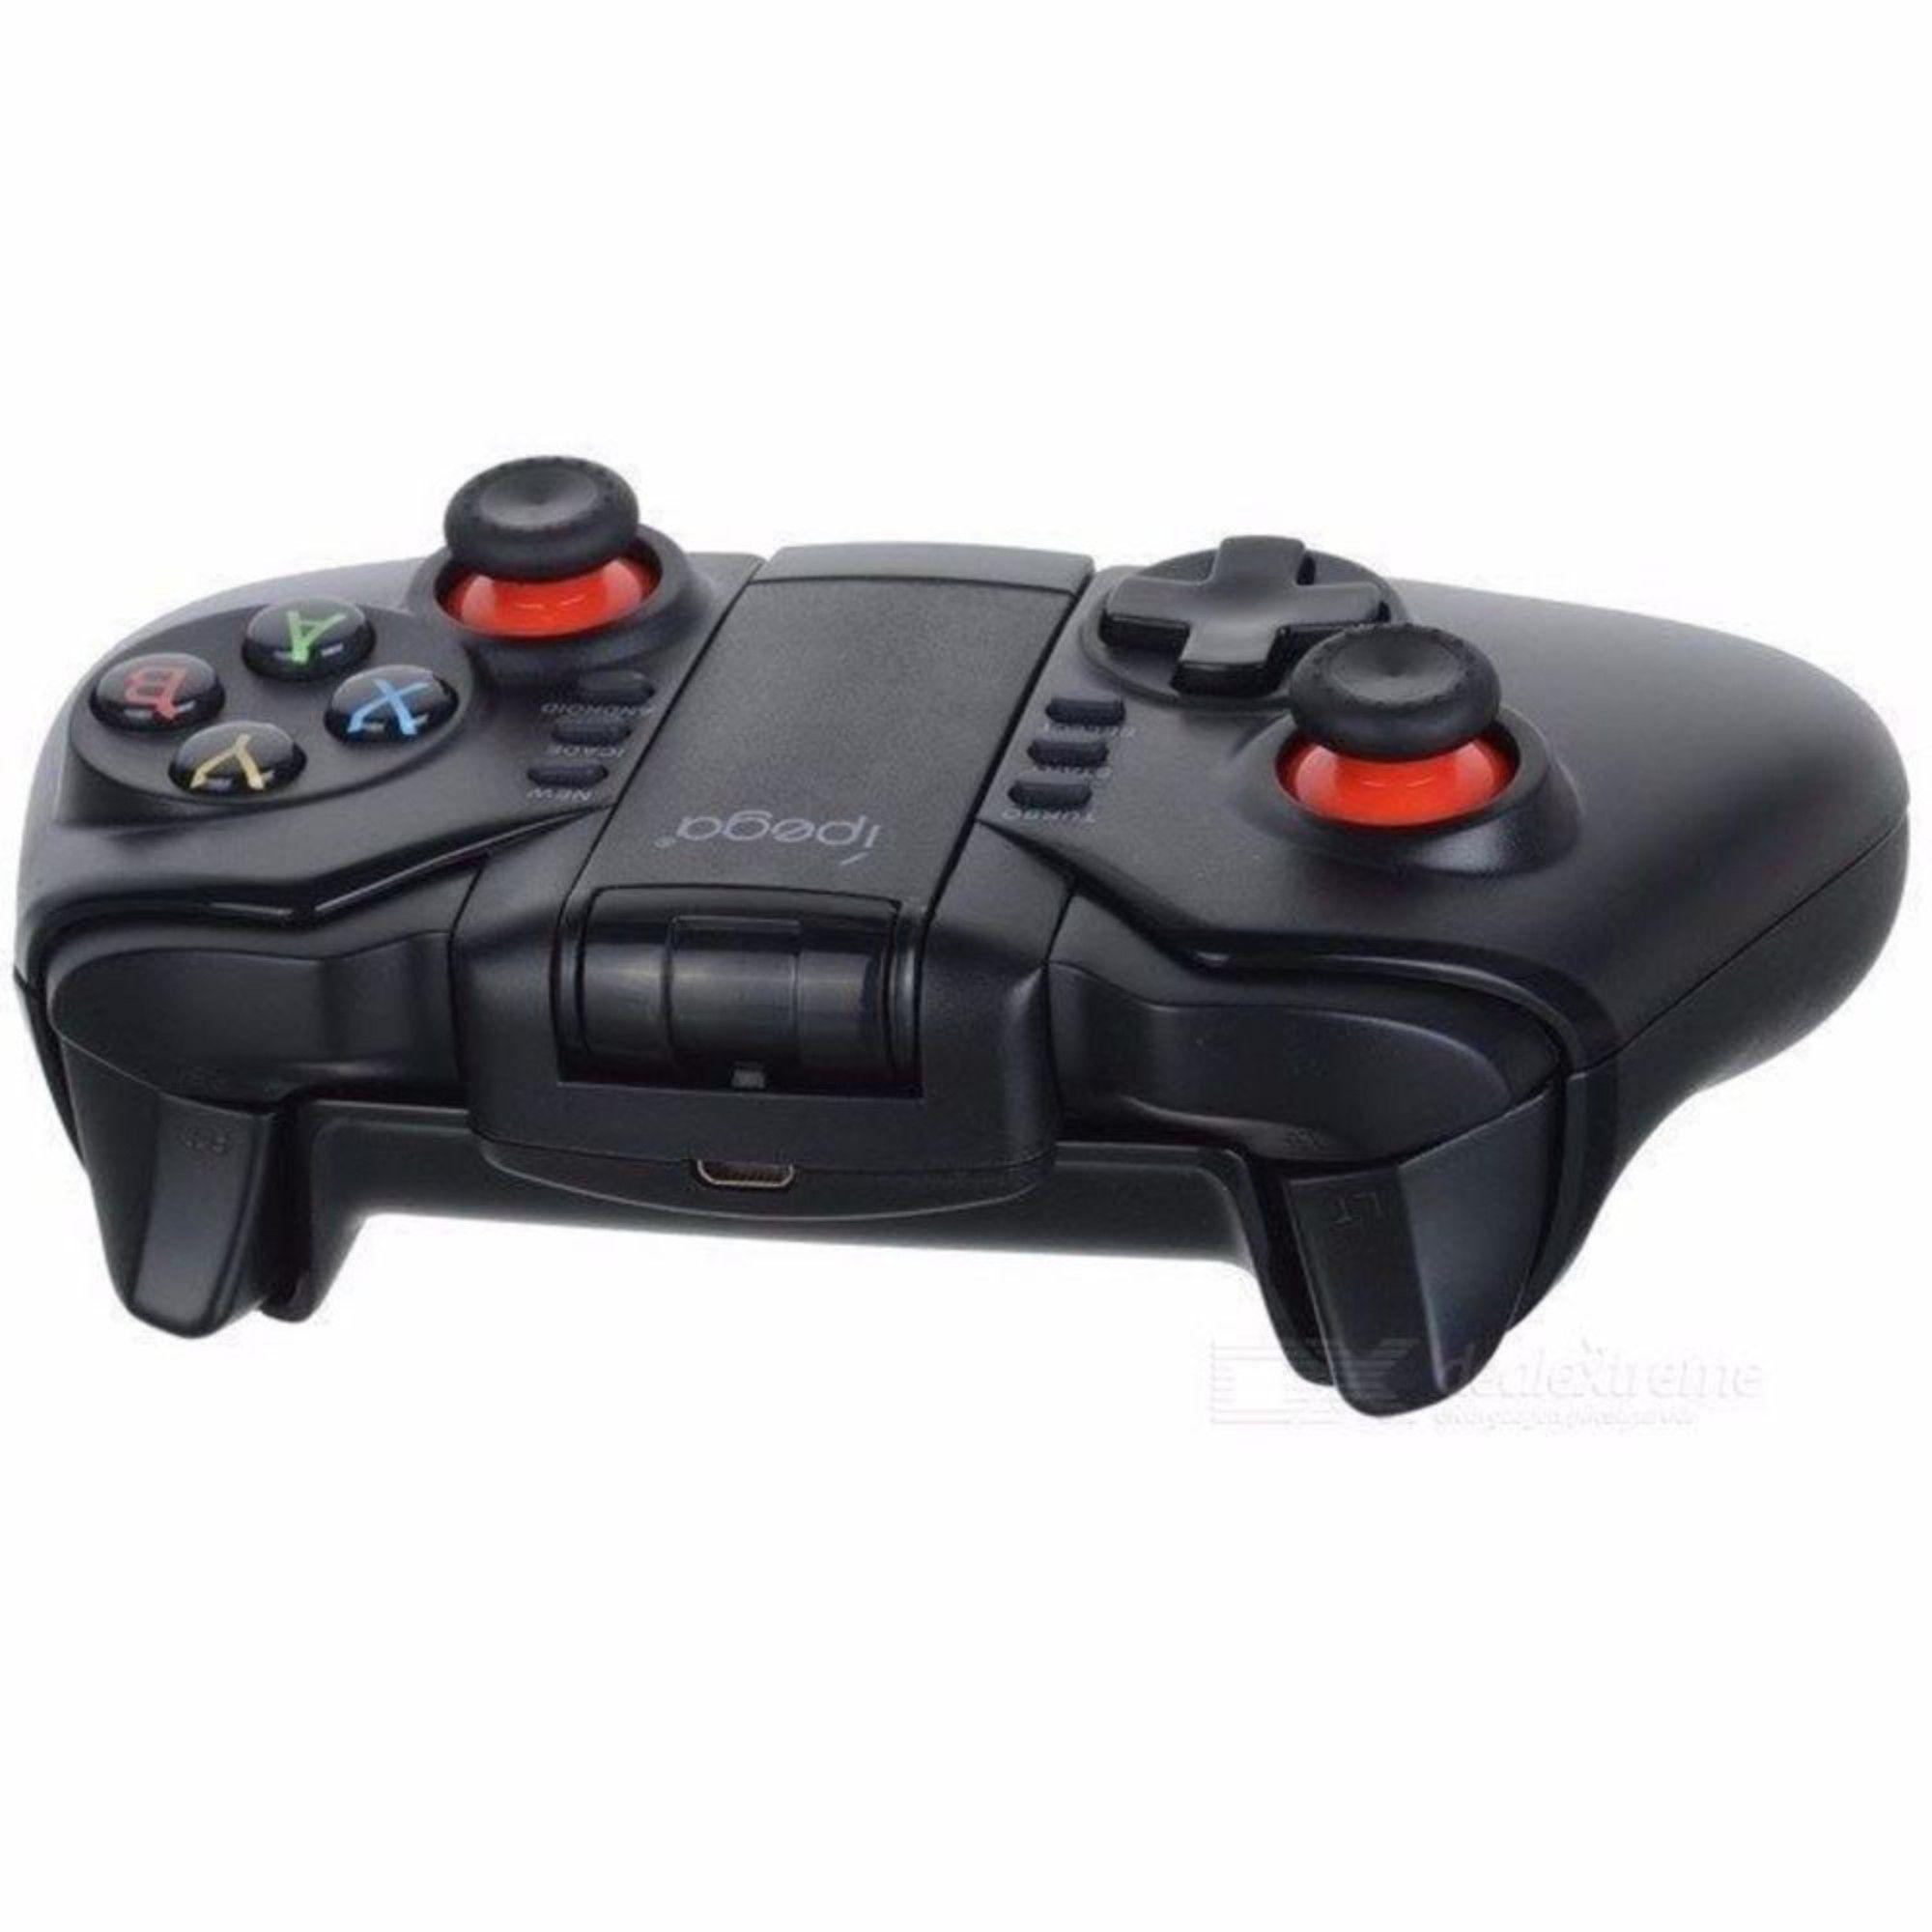 Controle Game Joystick Jogar Celular Bluetooth Android